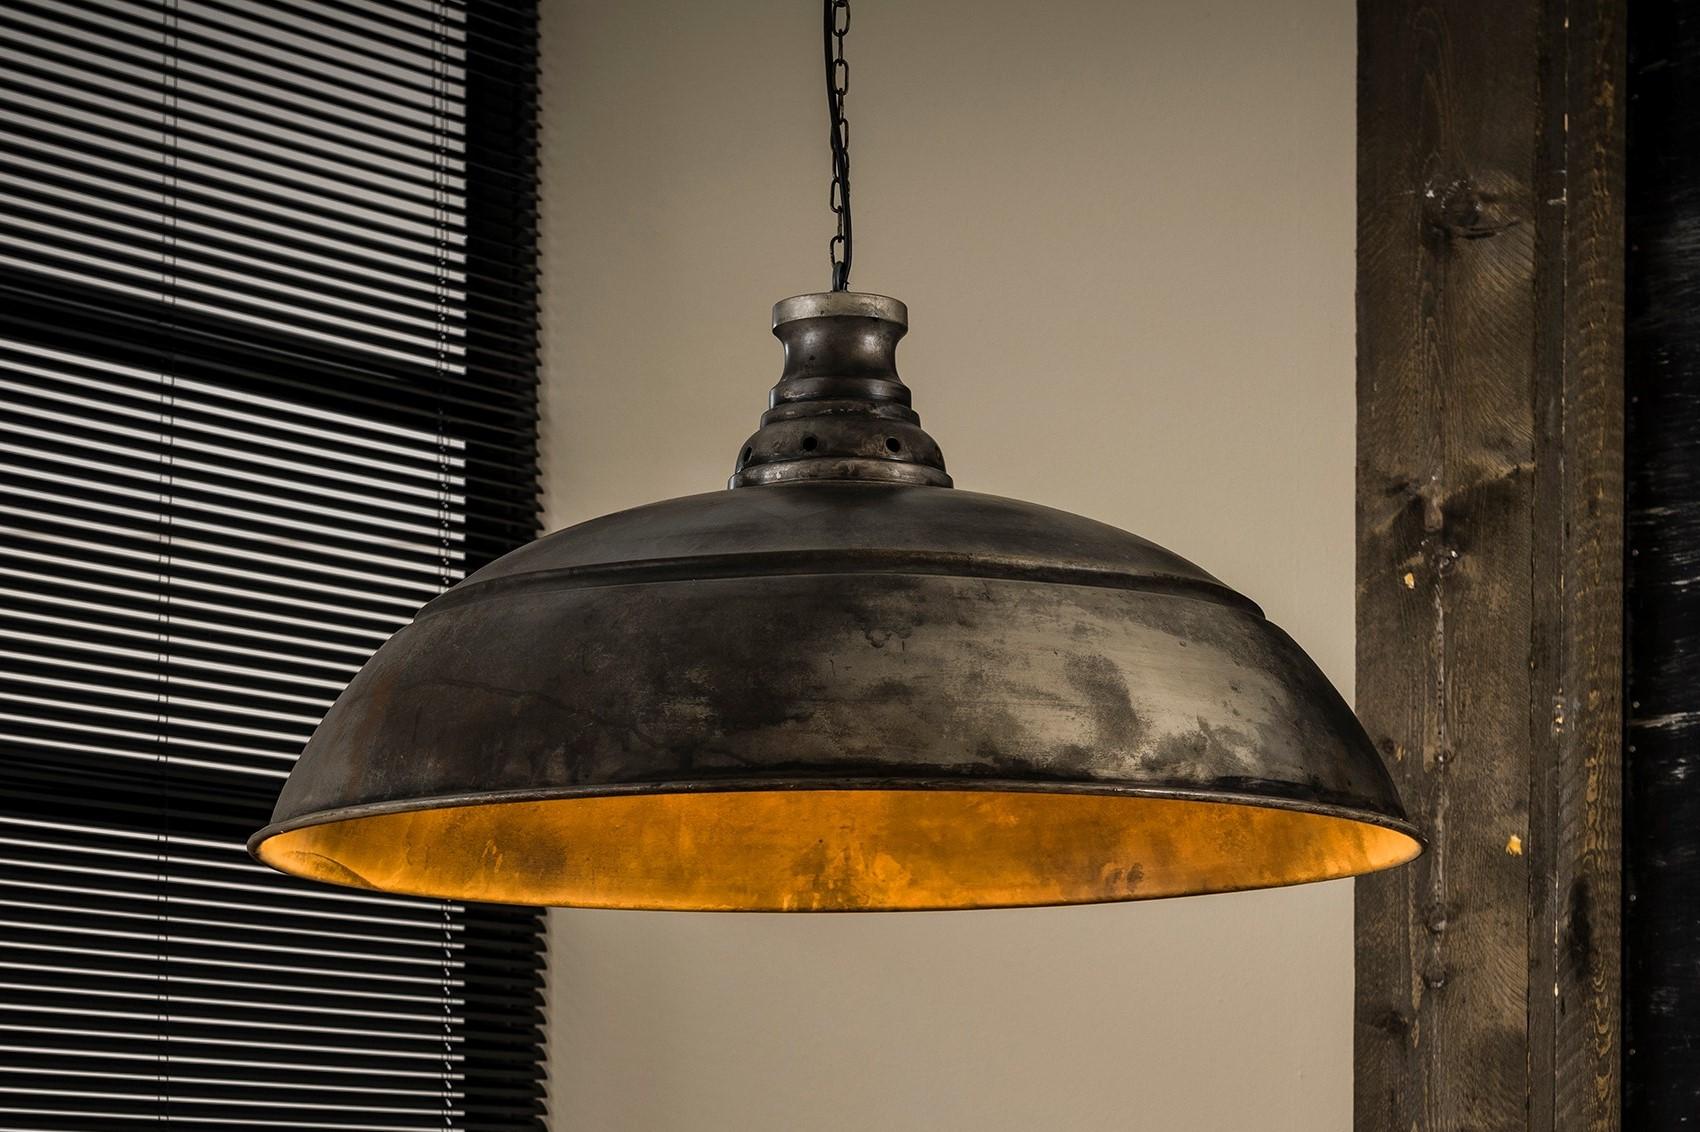 Hngelampe Pendelleuchte Lampen Industrie Style